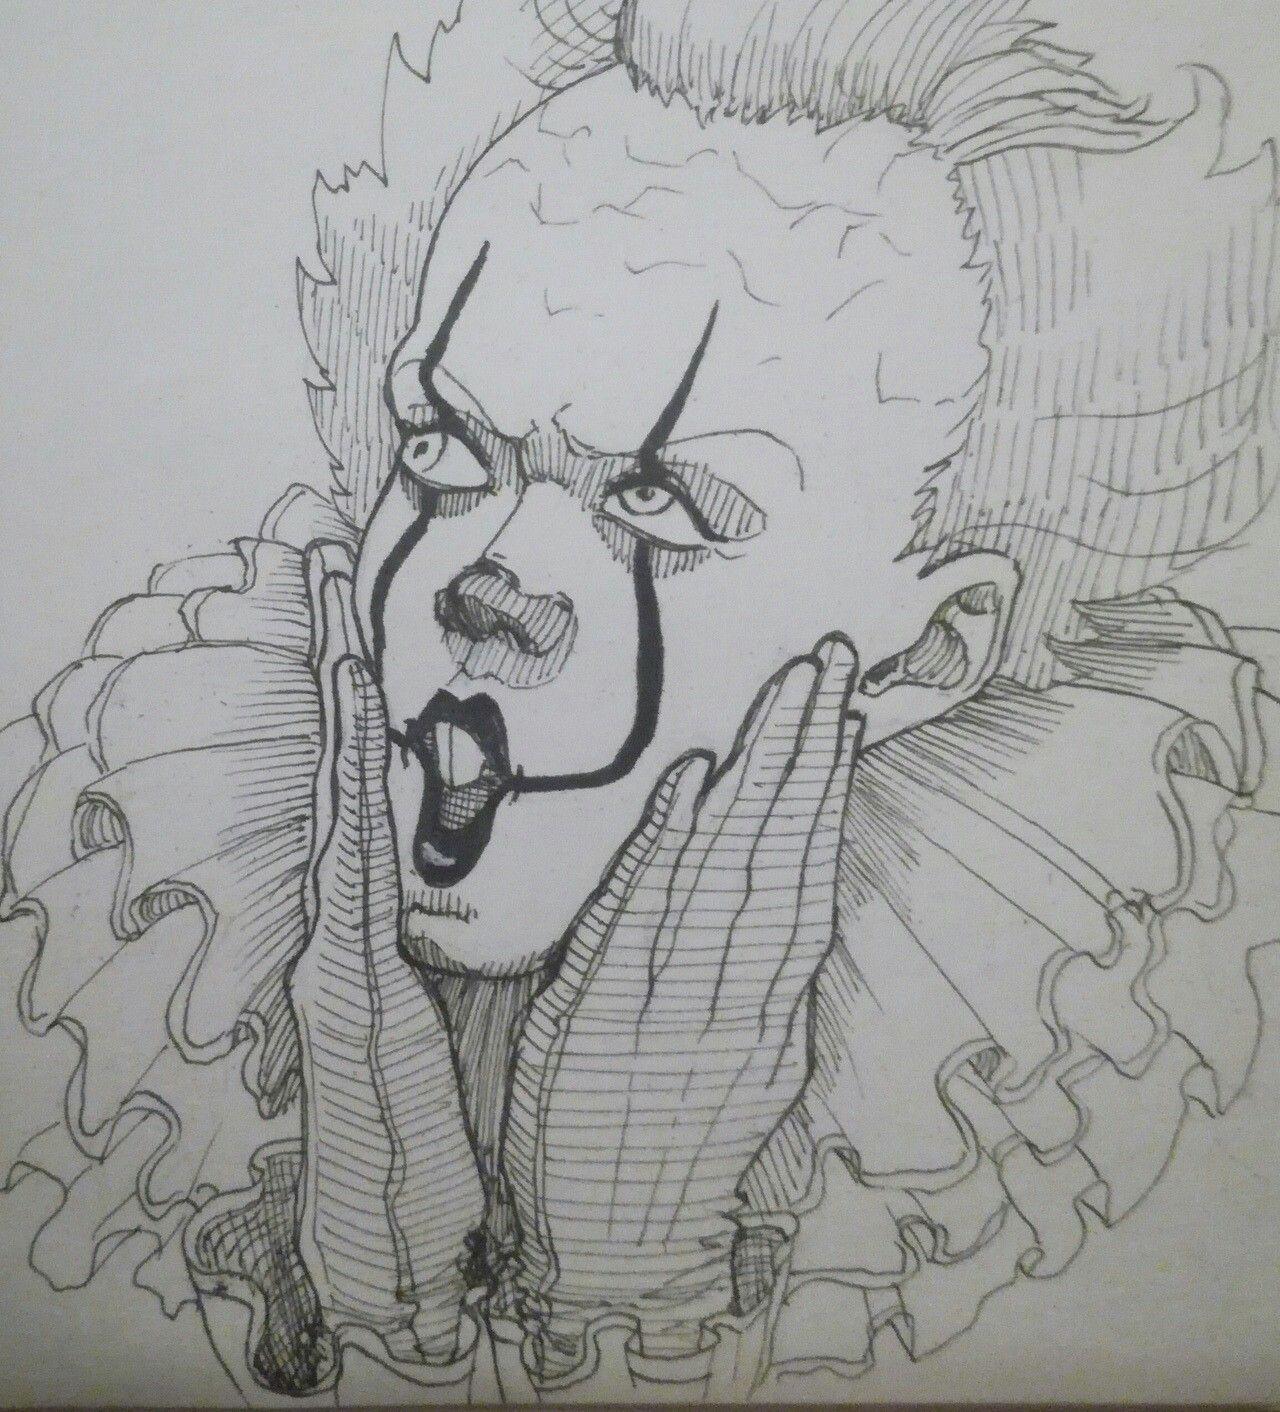 Esta Hermoso Dibujos Terrorificos Peliculas De Terror Dibujos